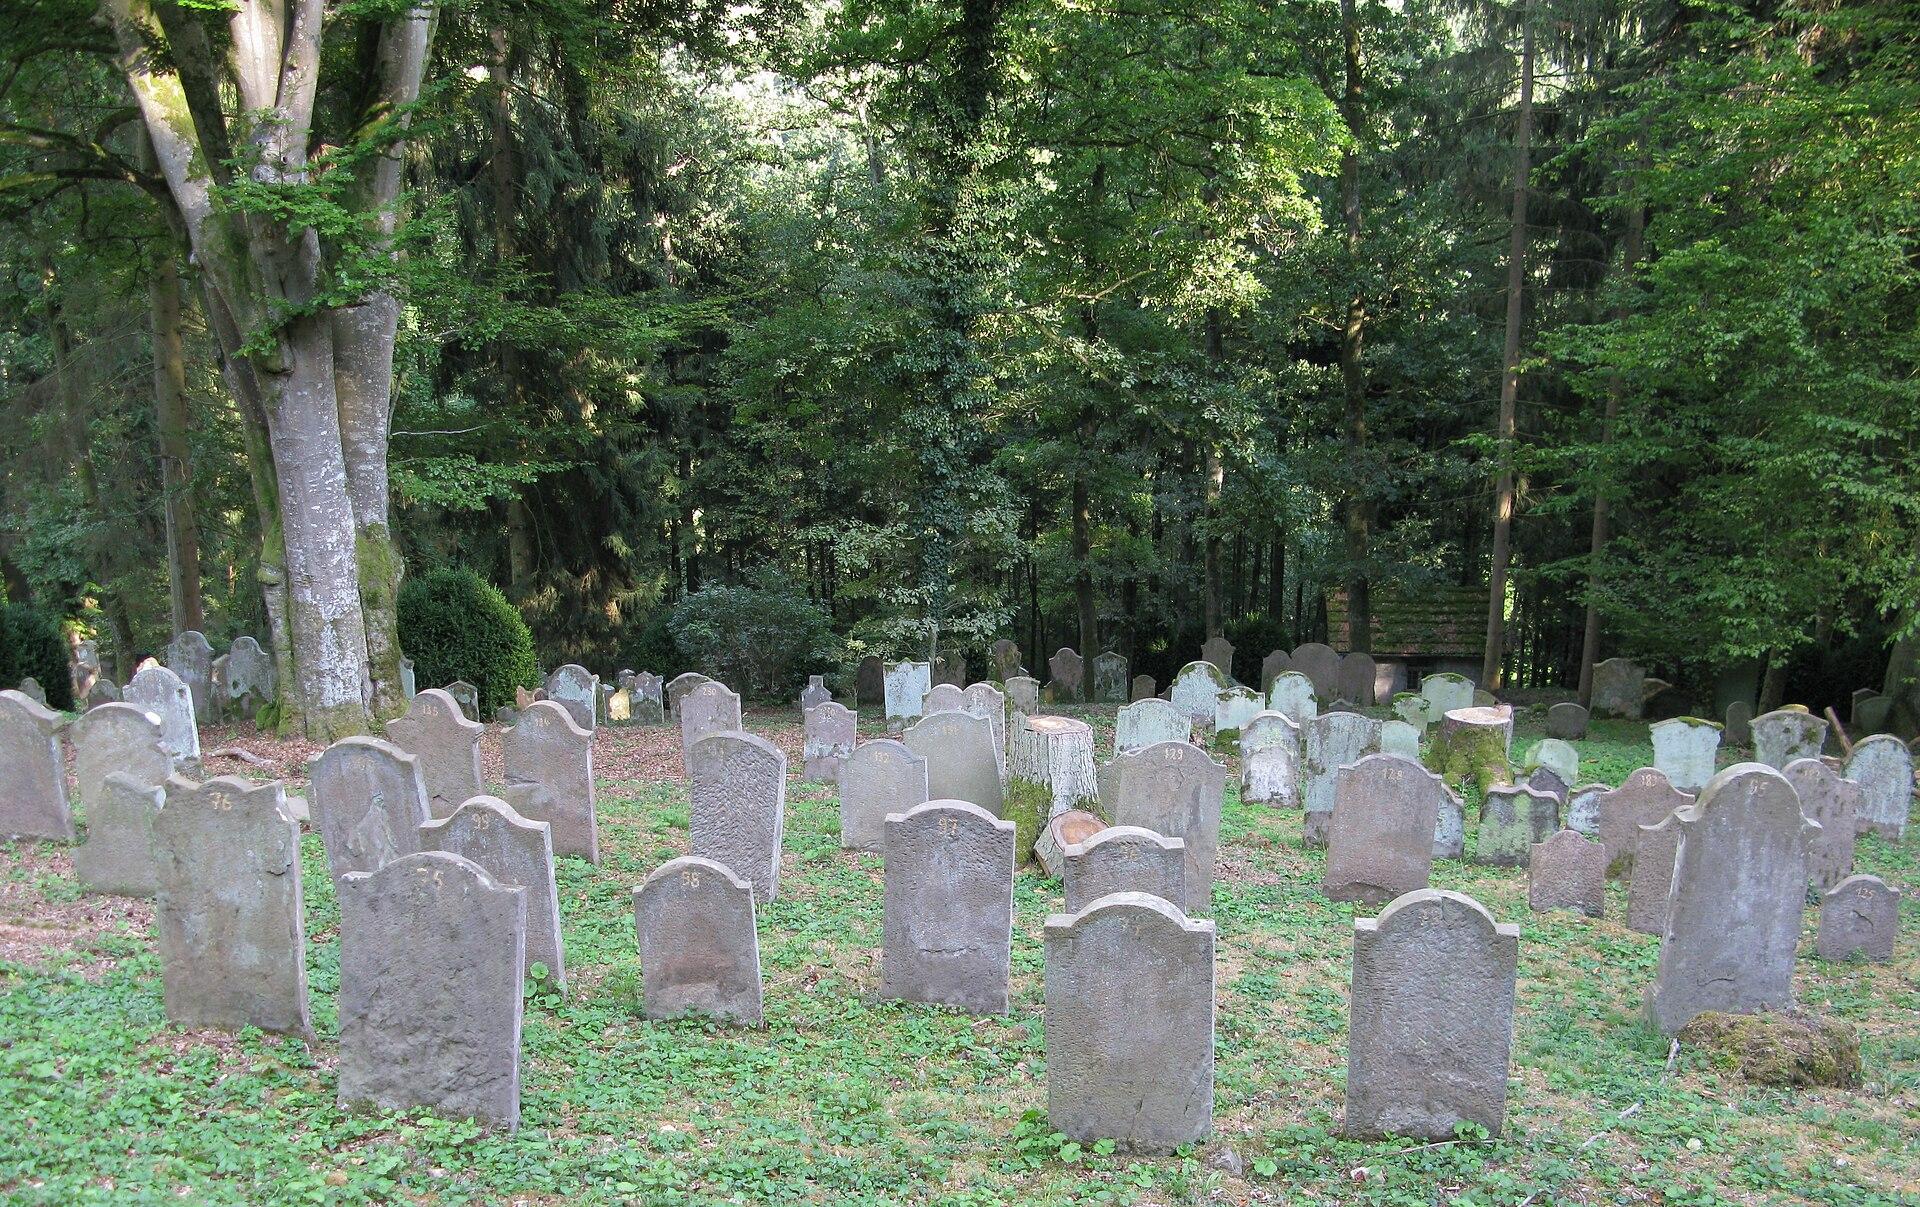 Jüdischer Friedhof Mühringen.jpg